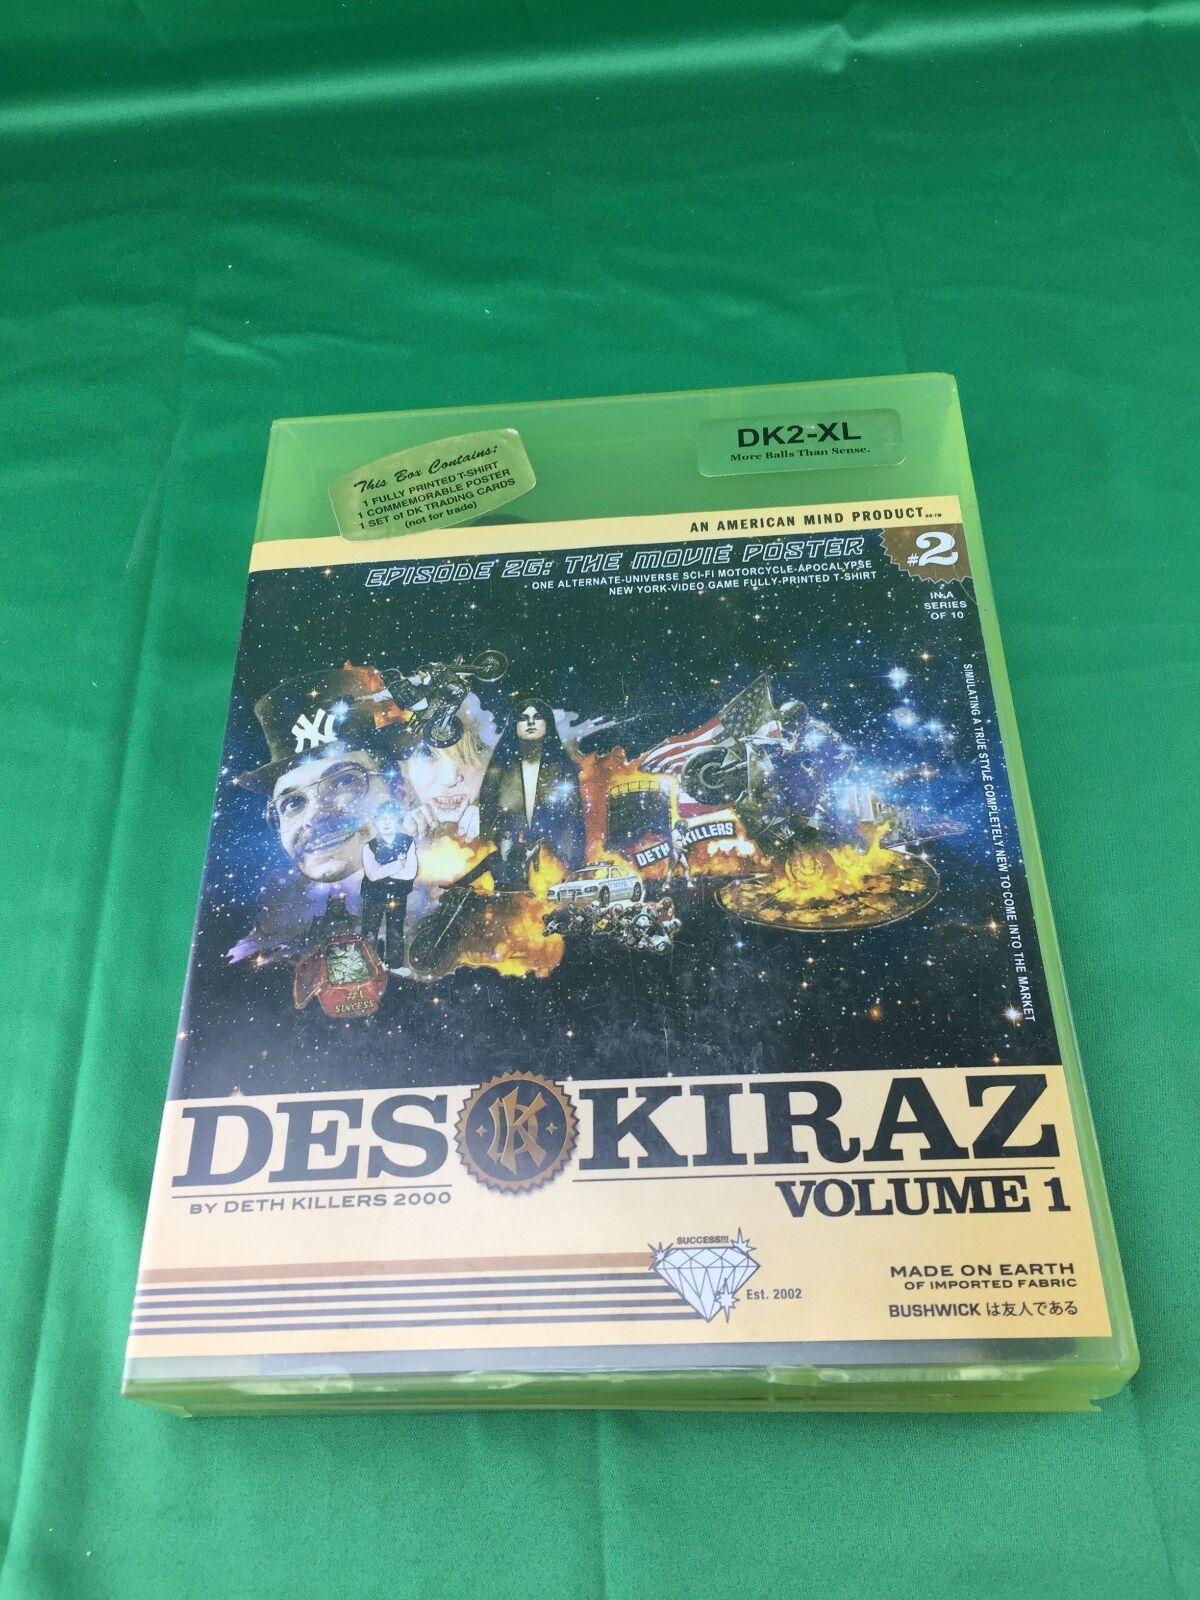 Deth Killers 2000 Volume 1 T-shirt XL Des Kiraz Episode 26  The Movie Poster